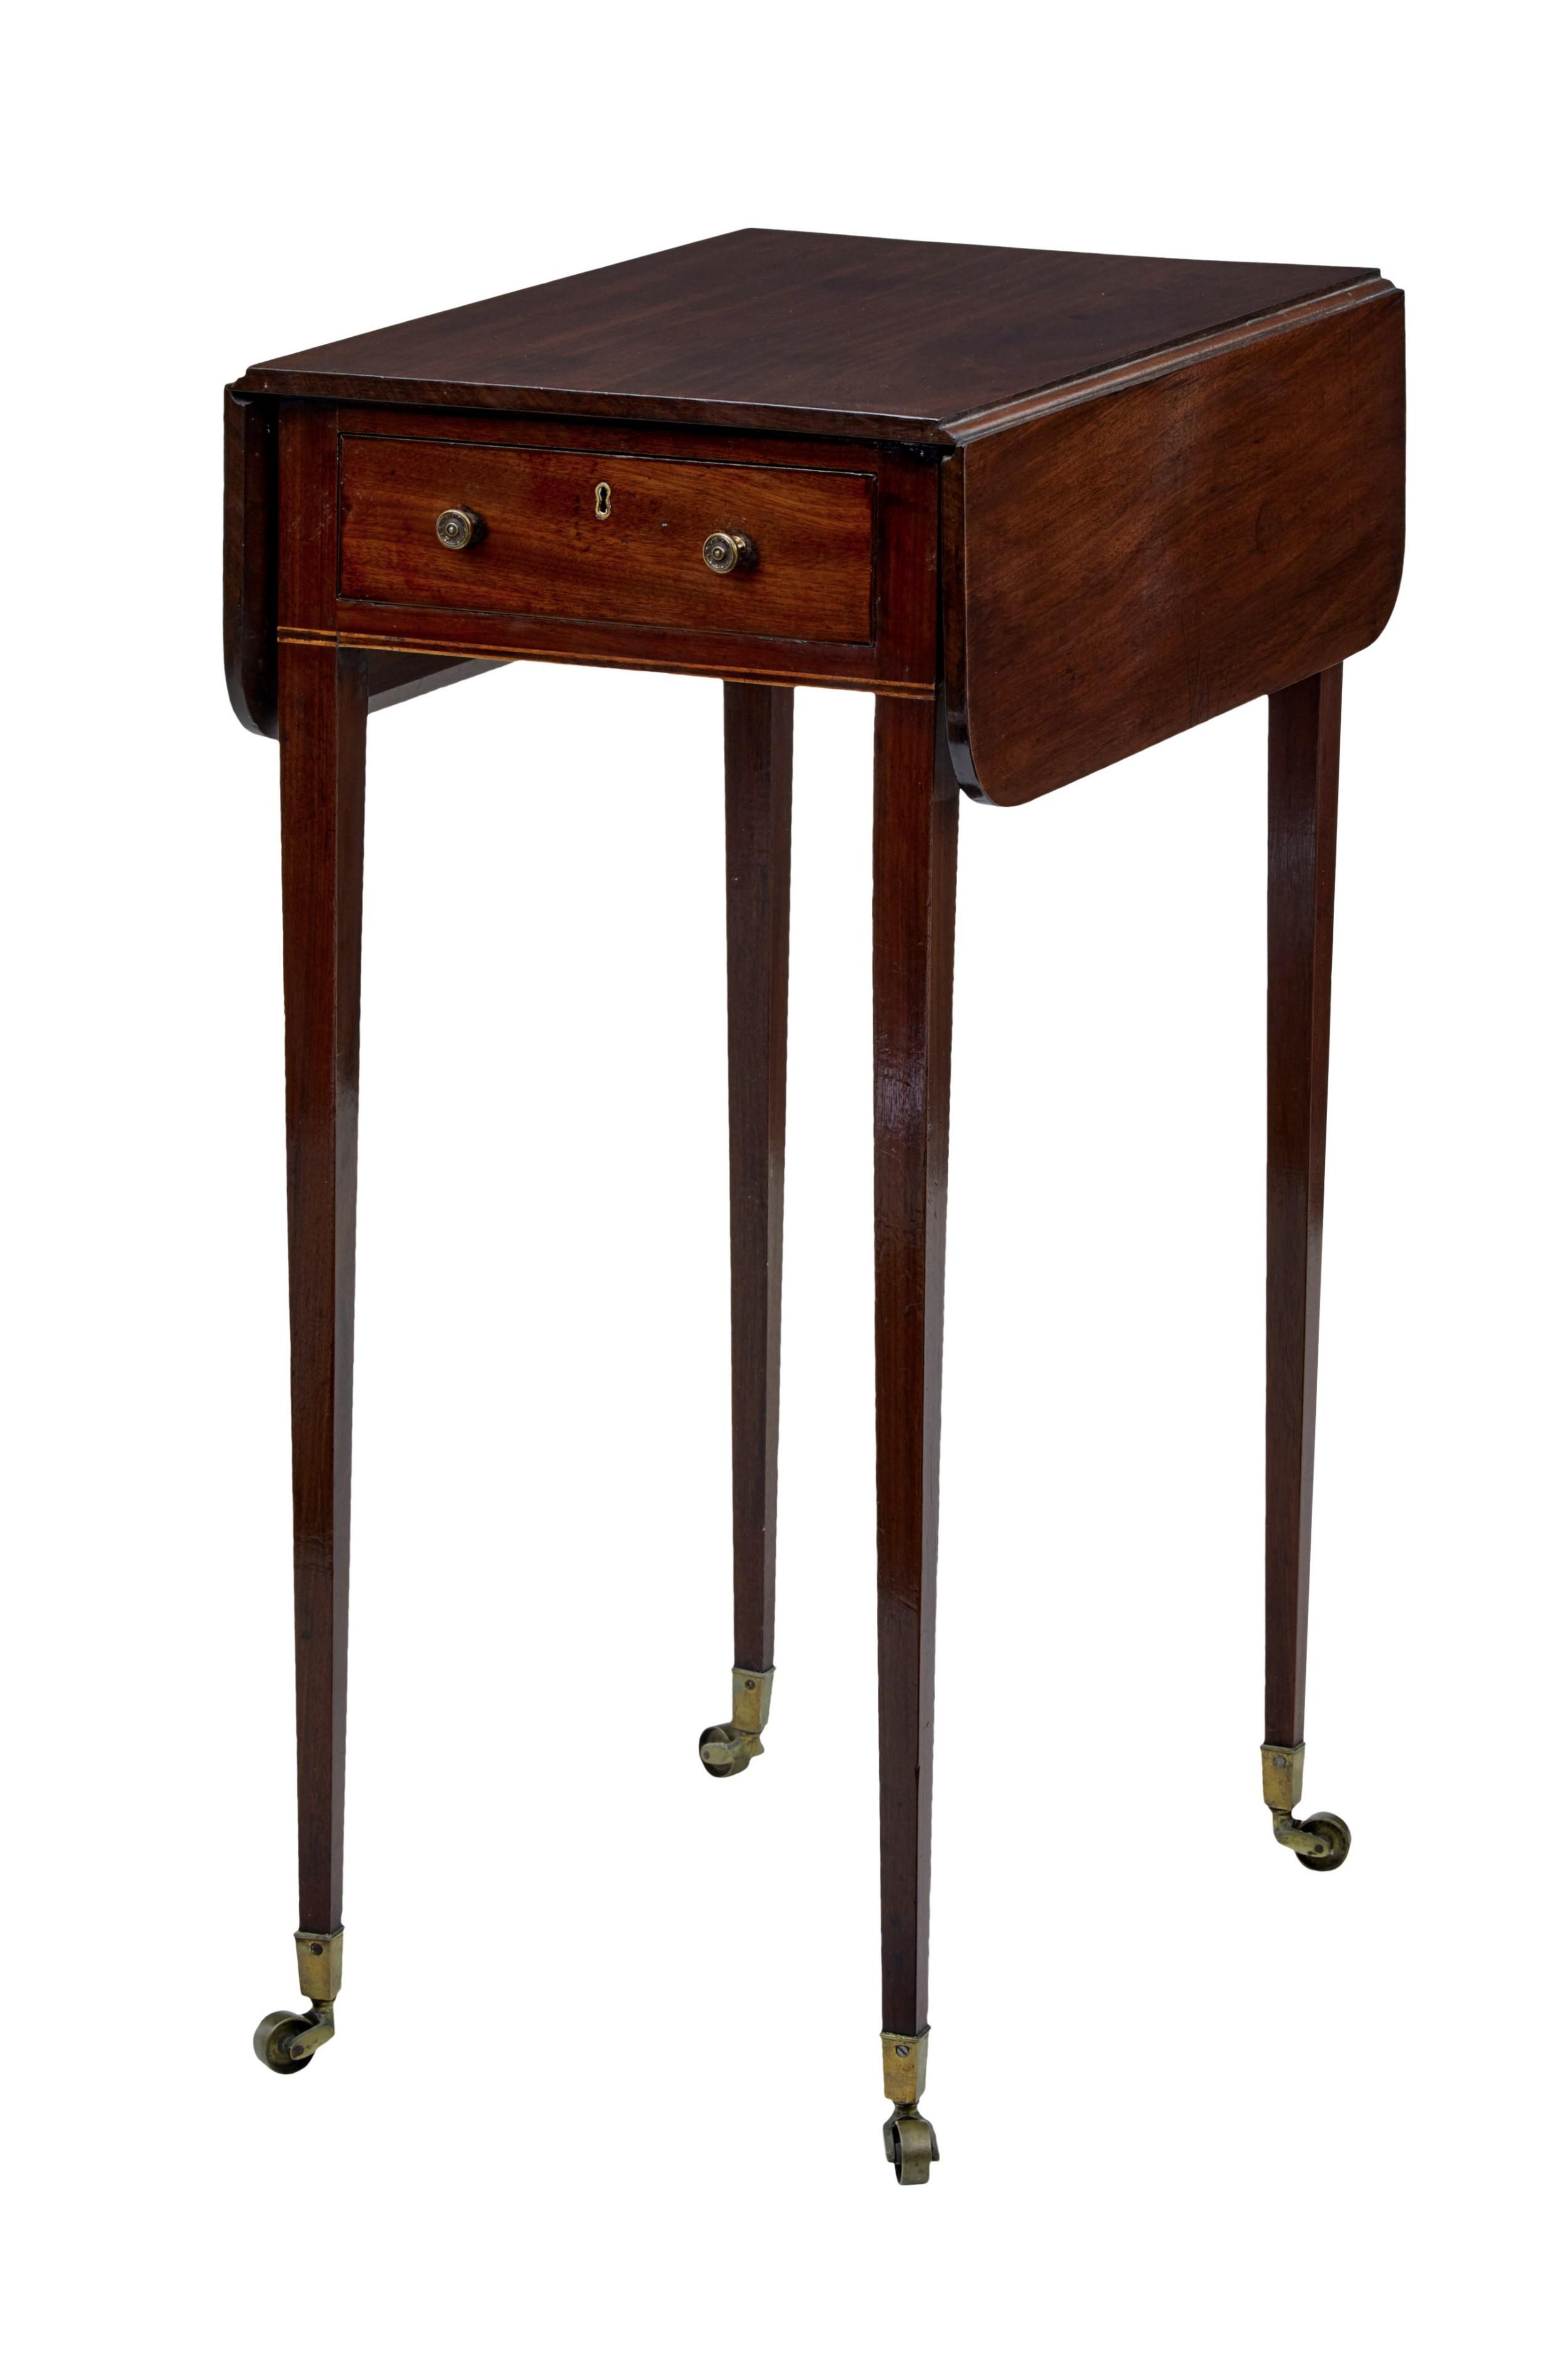 19th Century Regency Mahogany Small Drop Leaf Table